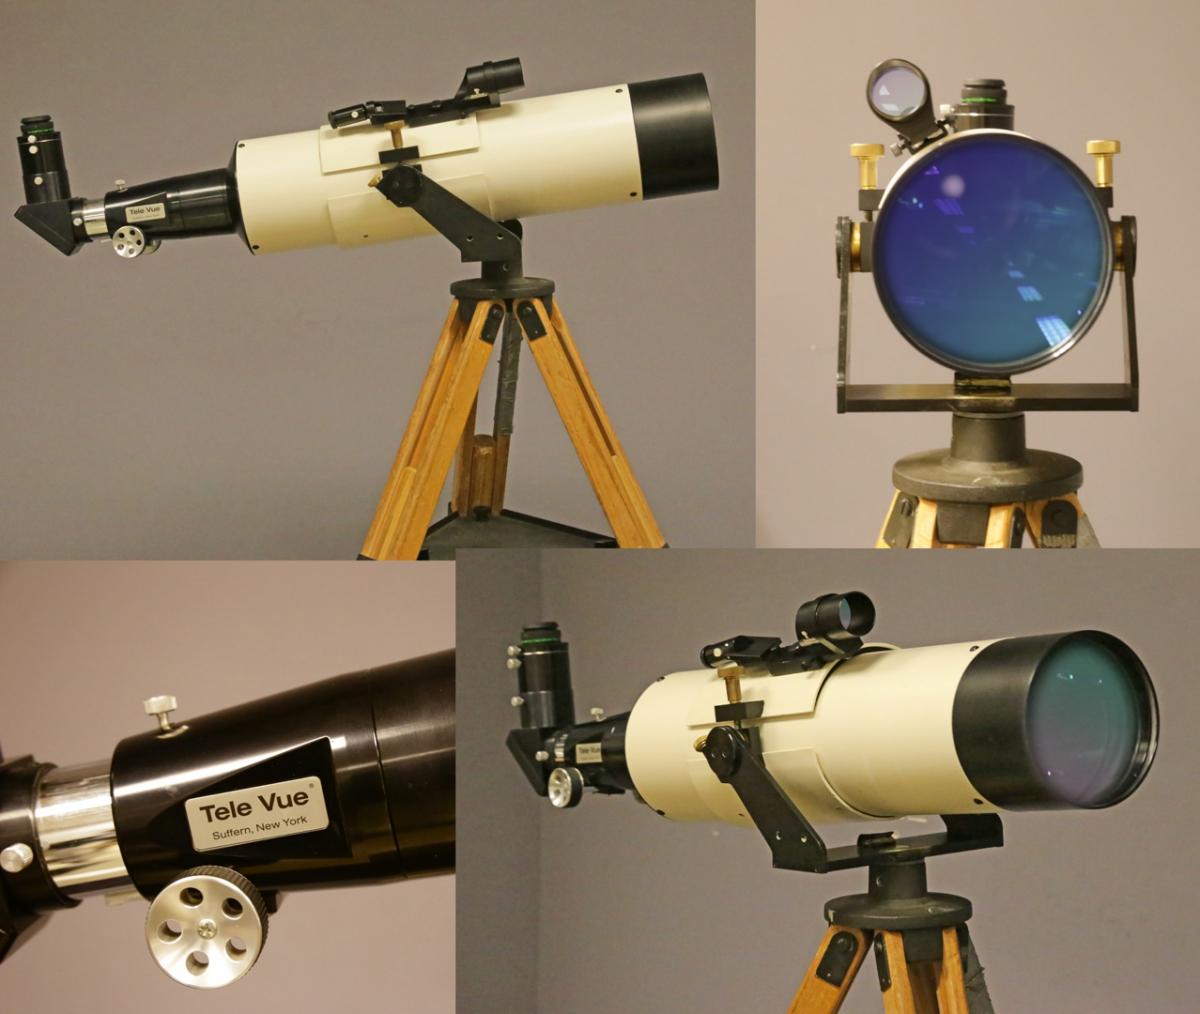 Clyde Bone's Tele Vue-140 Re-Built!